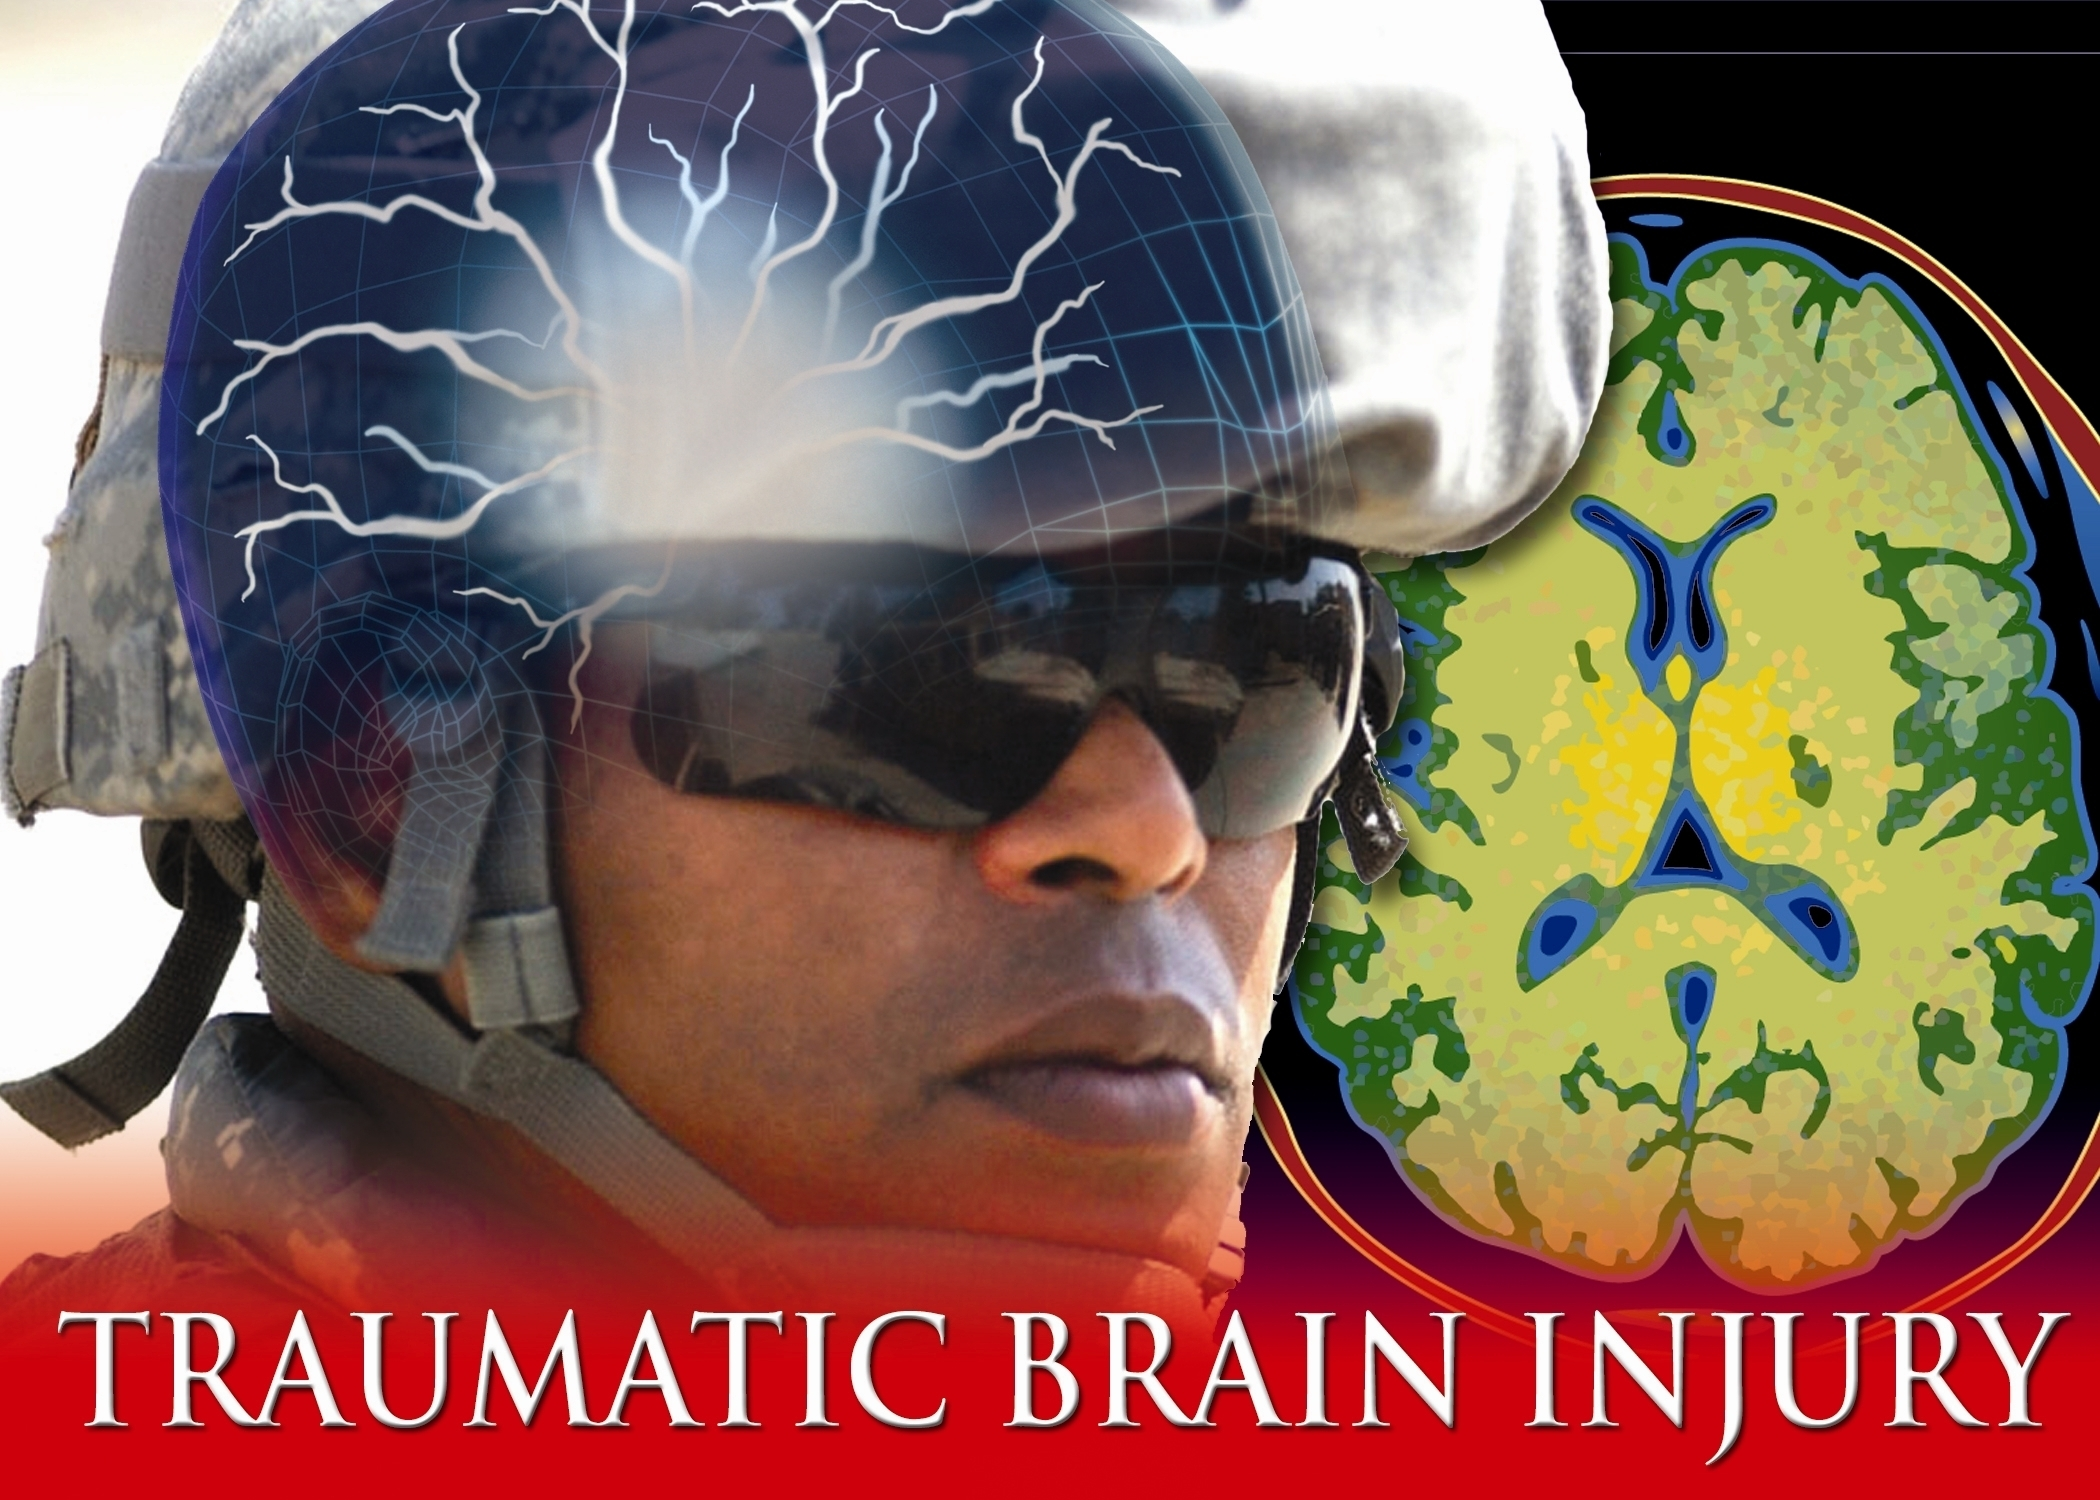 Traumatic brain injury, stroke